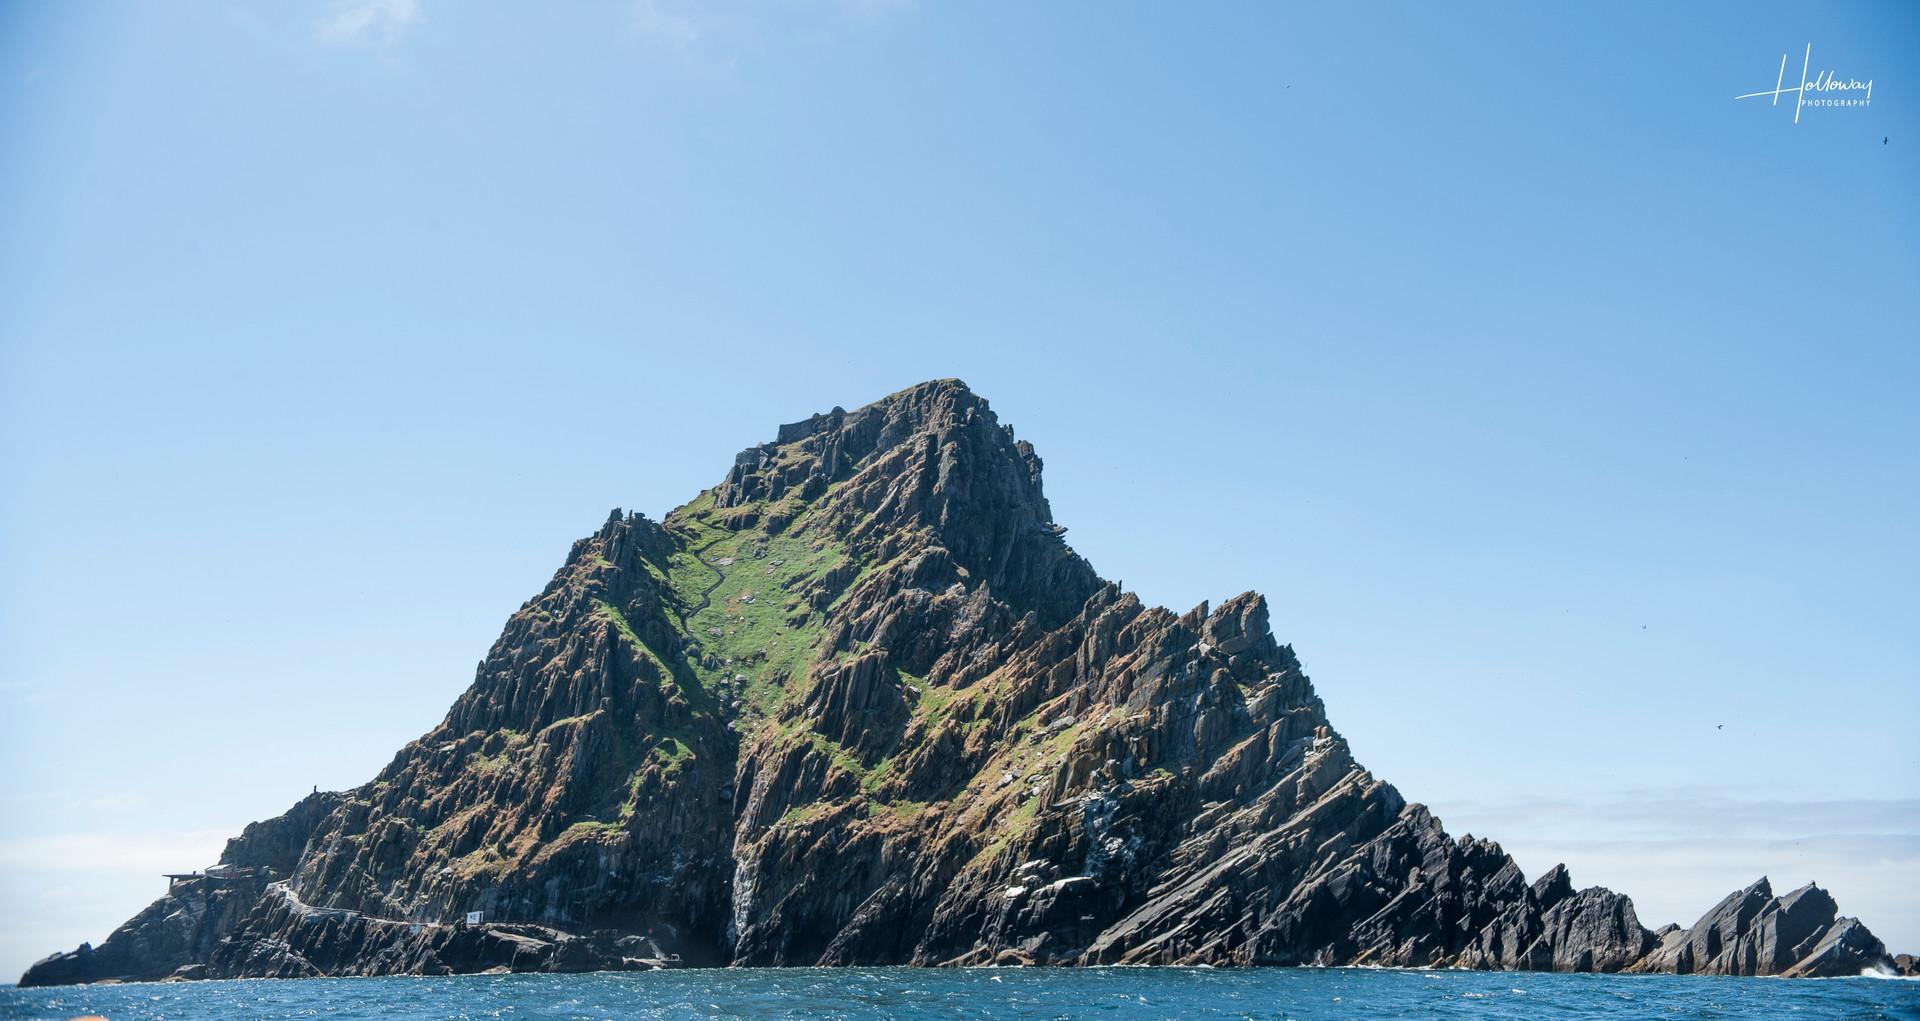 Skellig Michael Island off the coast of Ireland